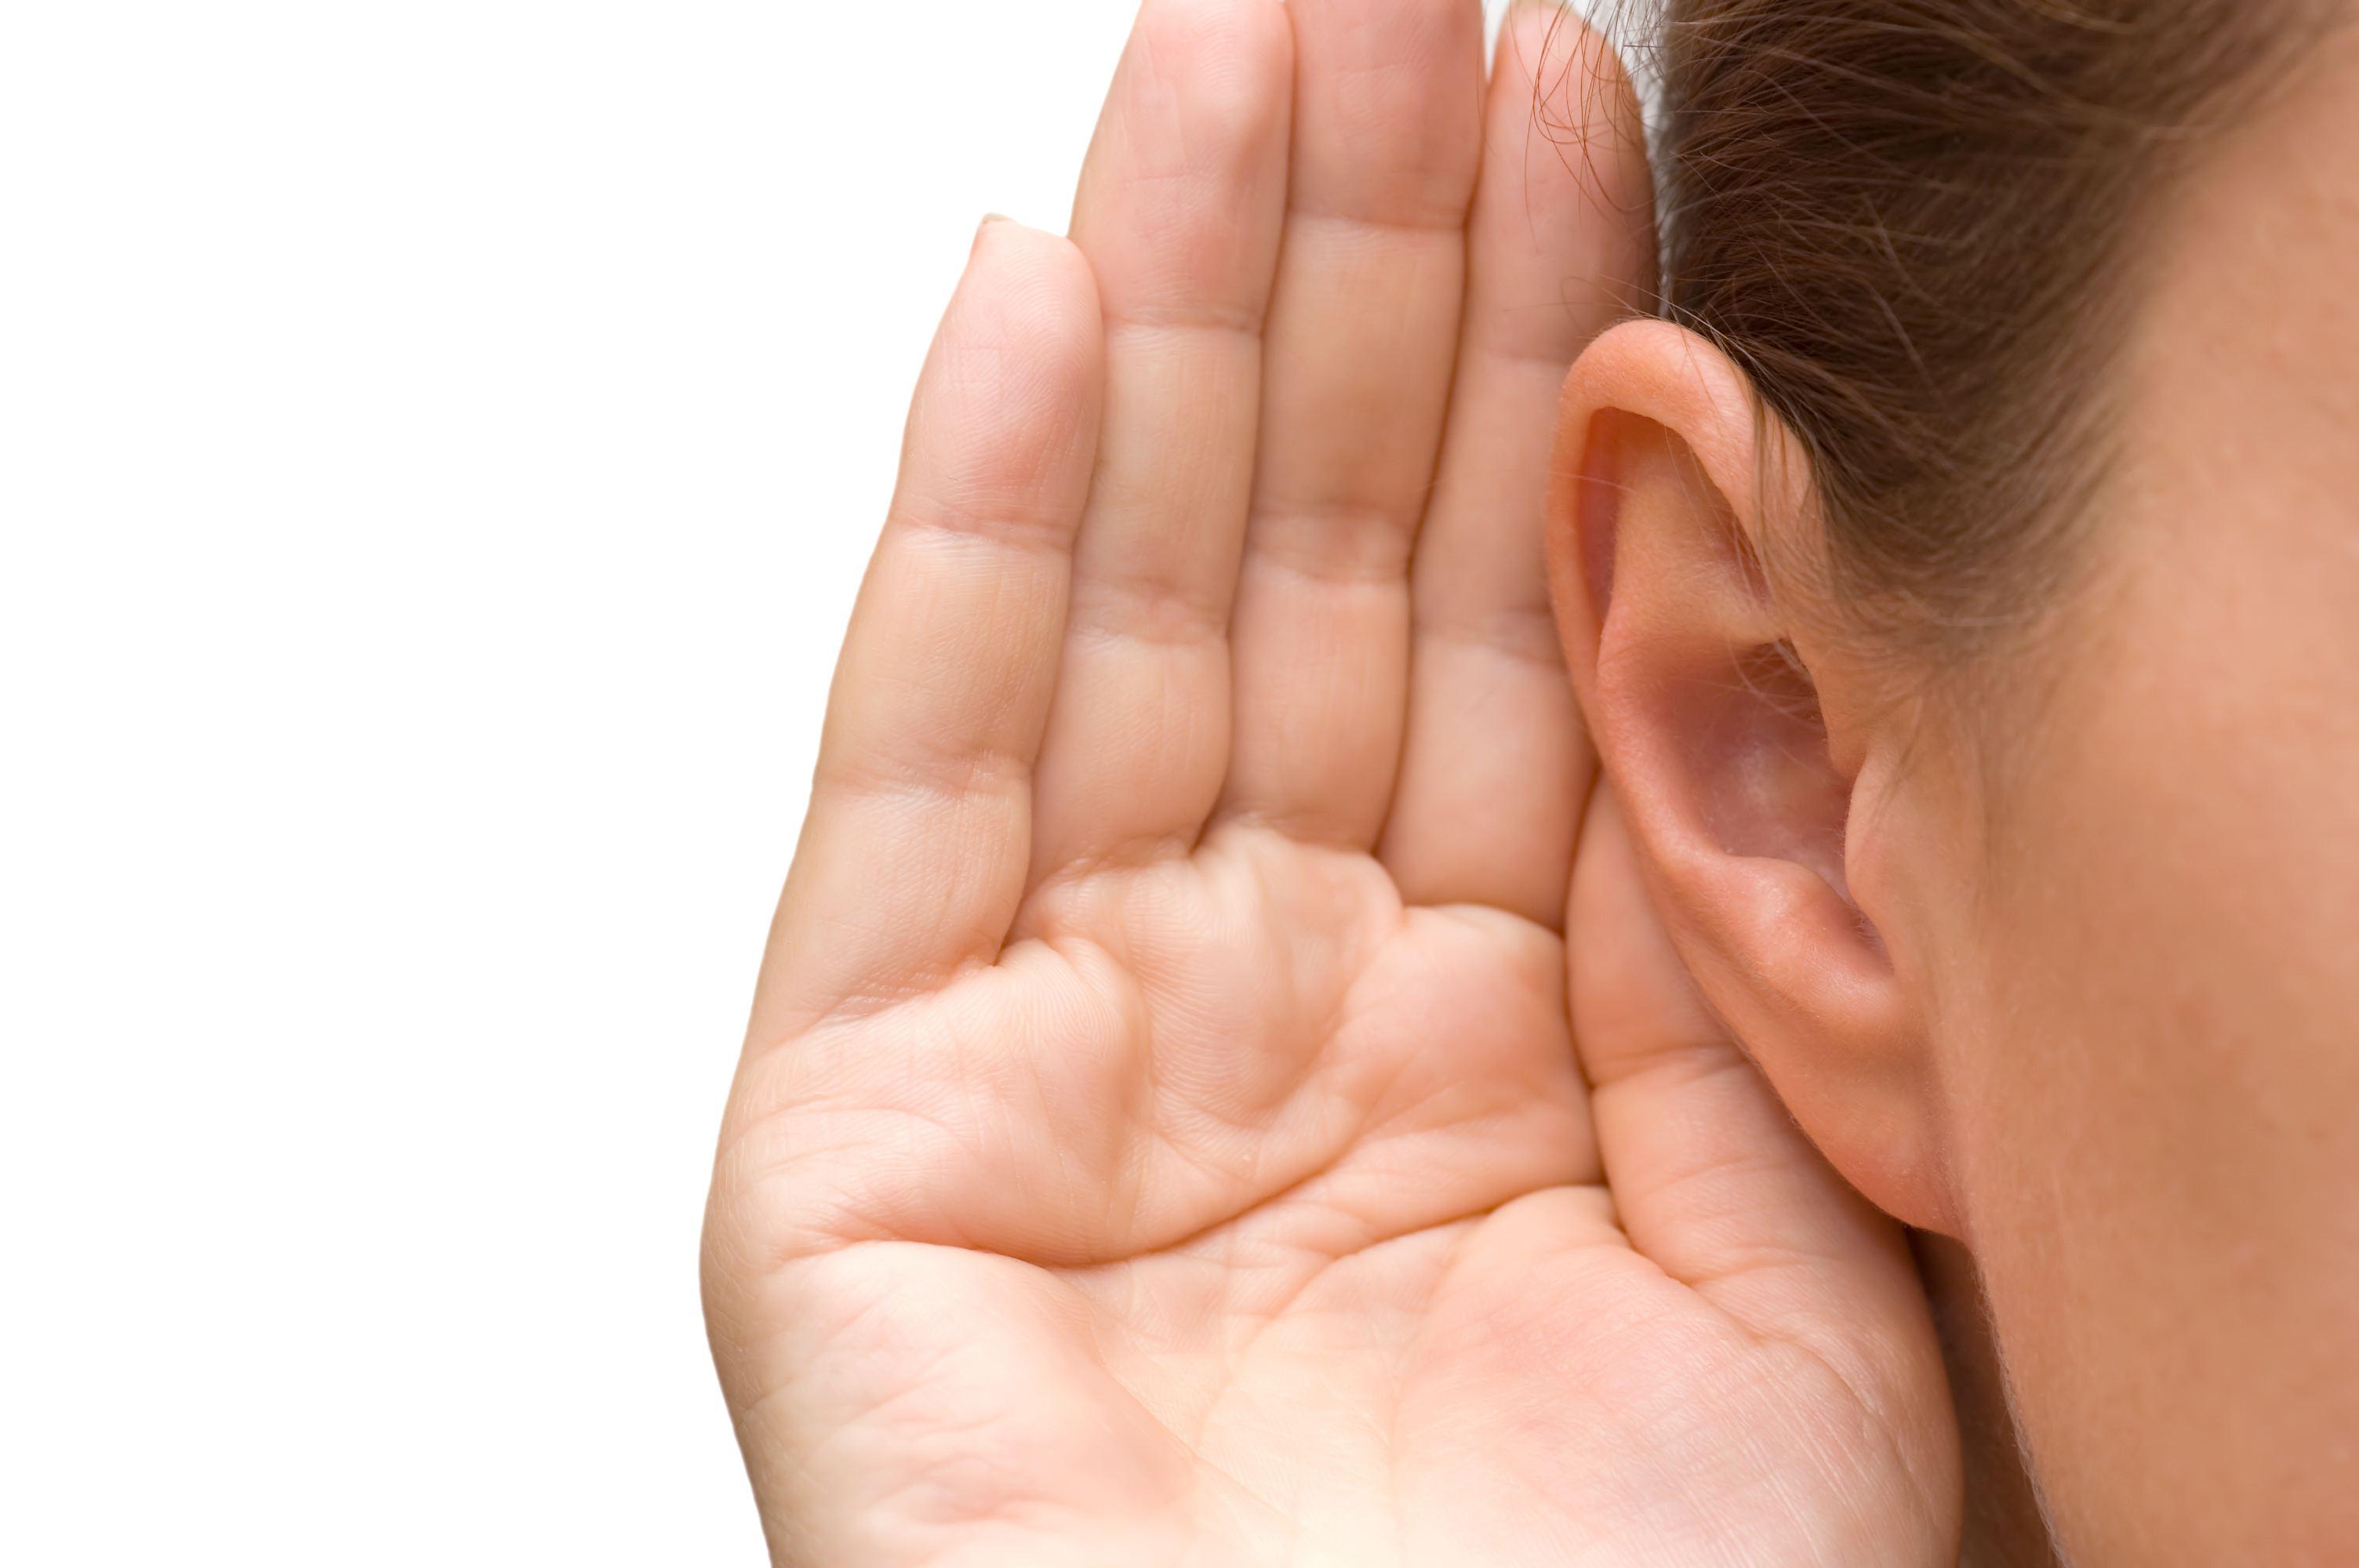 hipertenzija ir ausies užgulimas)